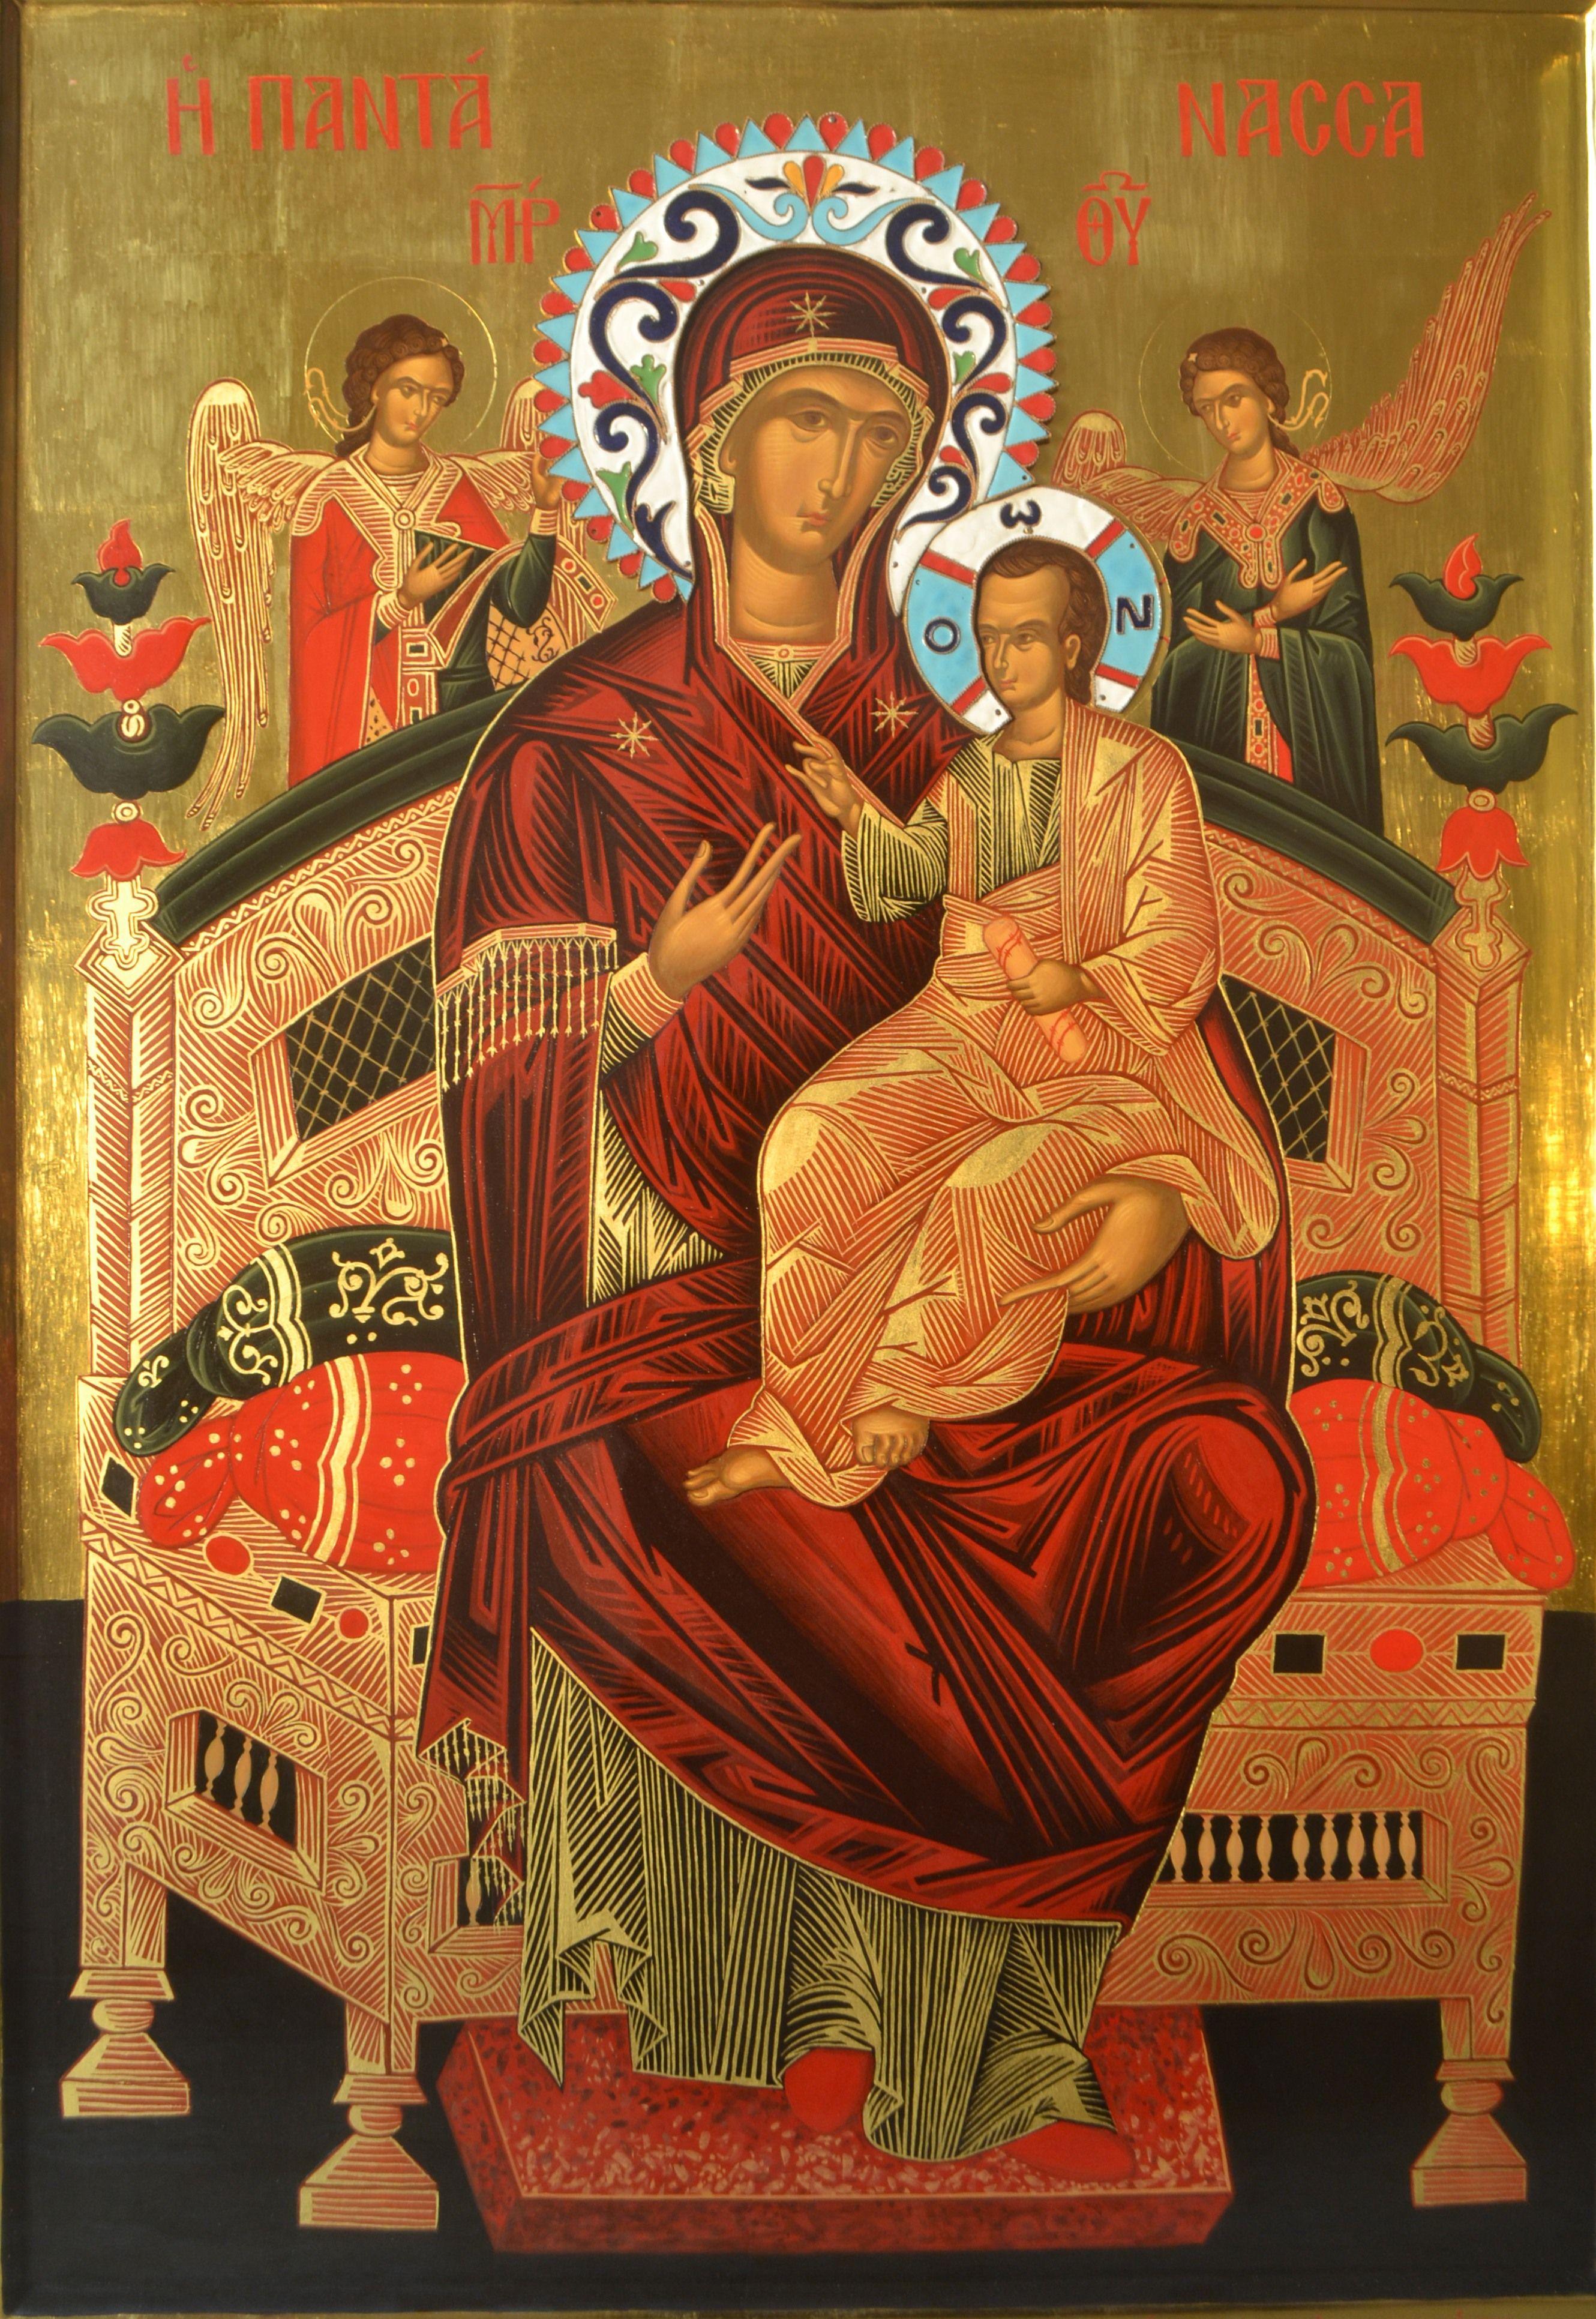 Healing Prayer. Vsetsaritsa (Pantaness) - icon of the Blessed Virgin Mary 97